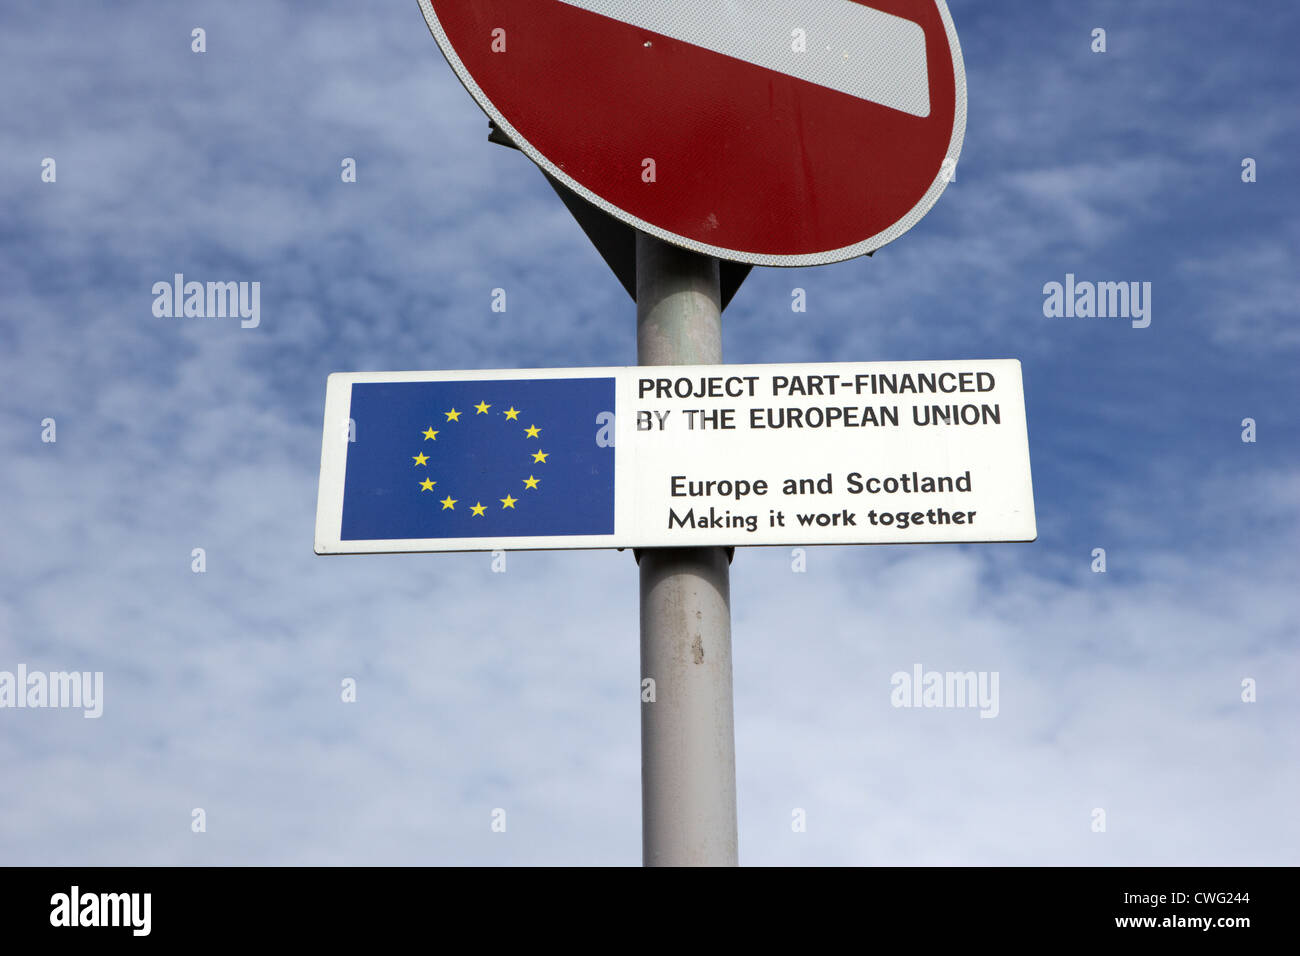 part financed by european union sign edinburgh, scotland, uk, united kingdom - Stock Image